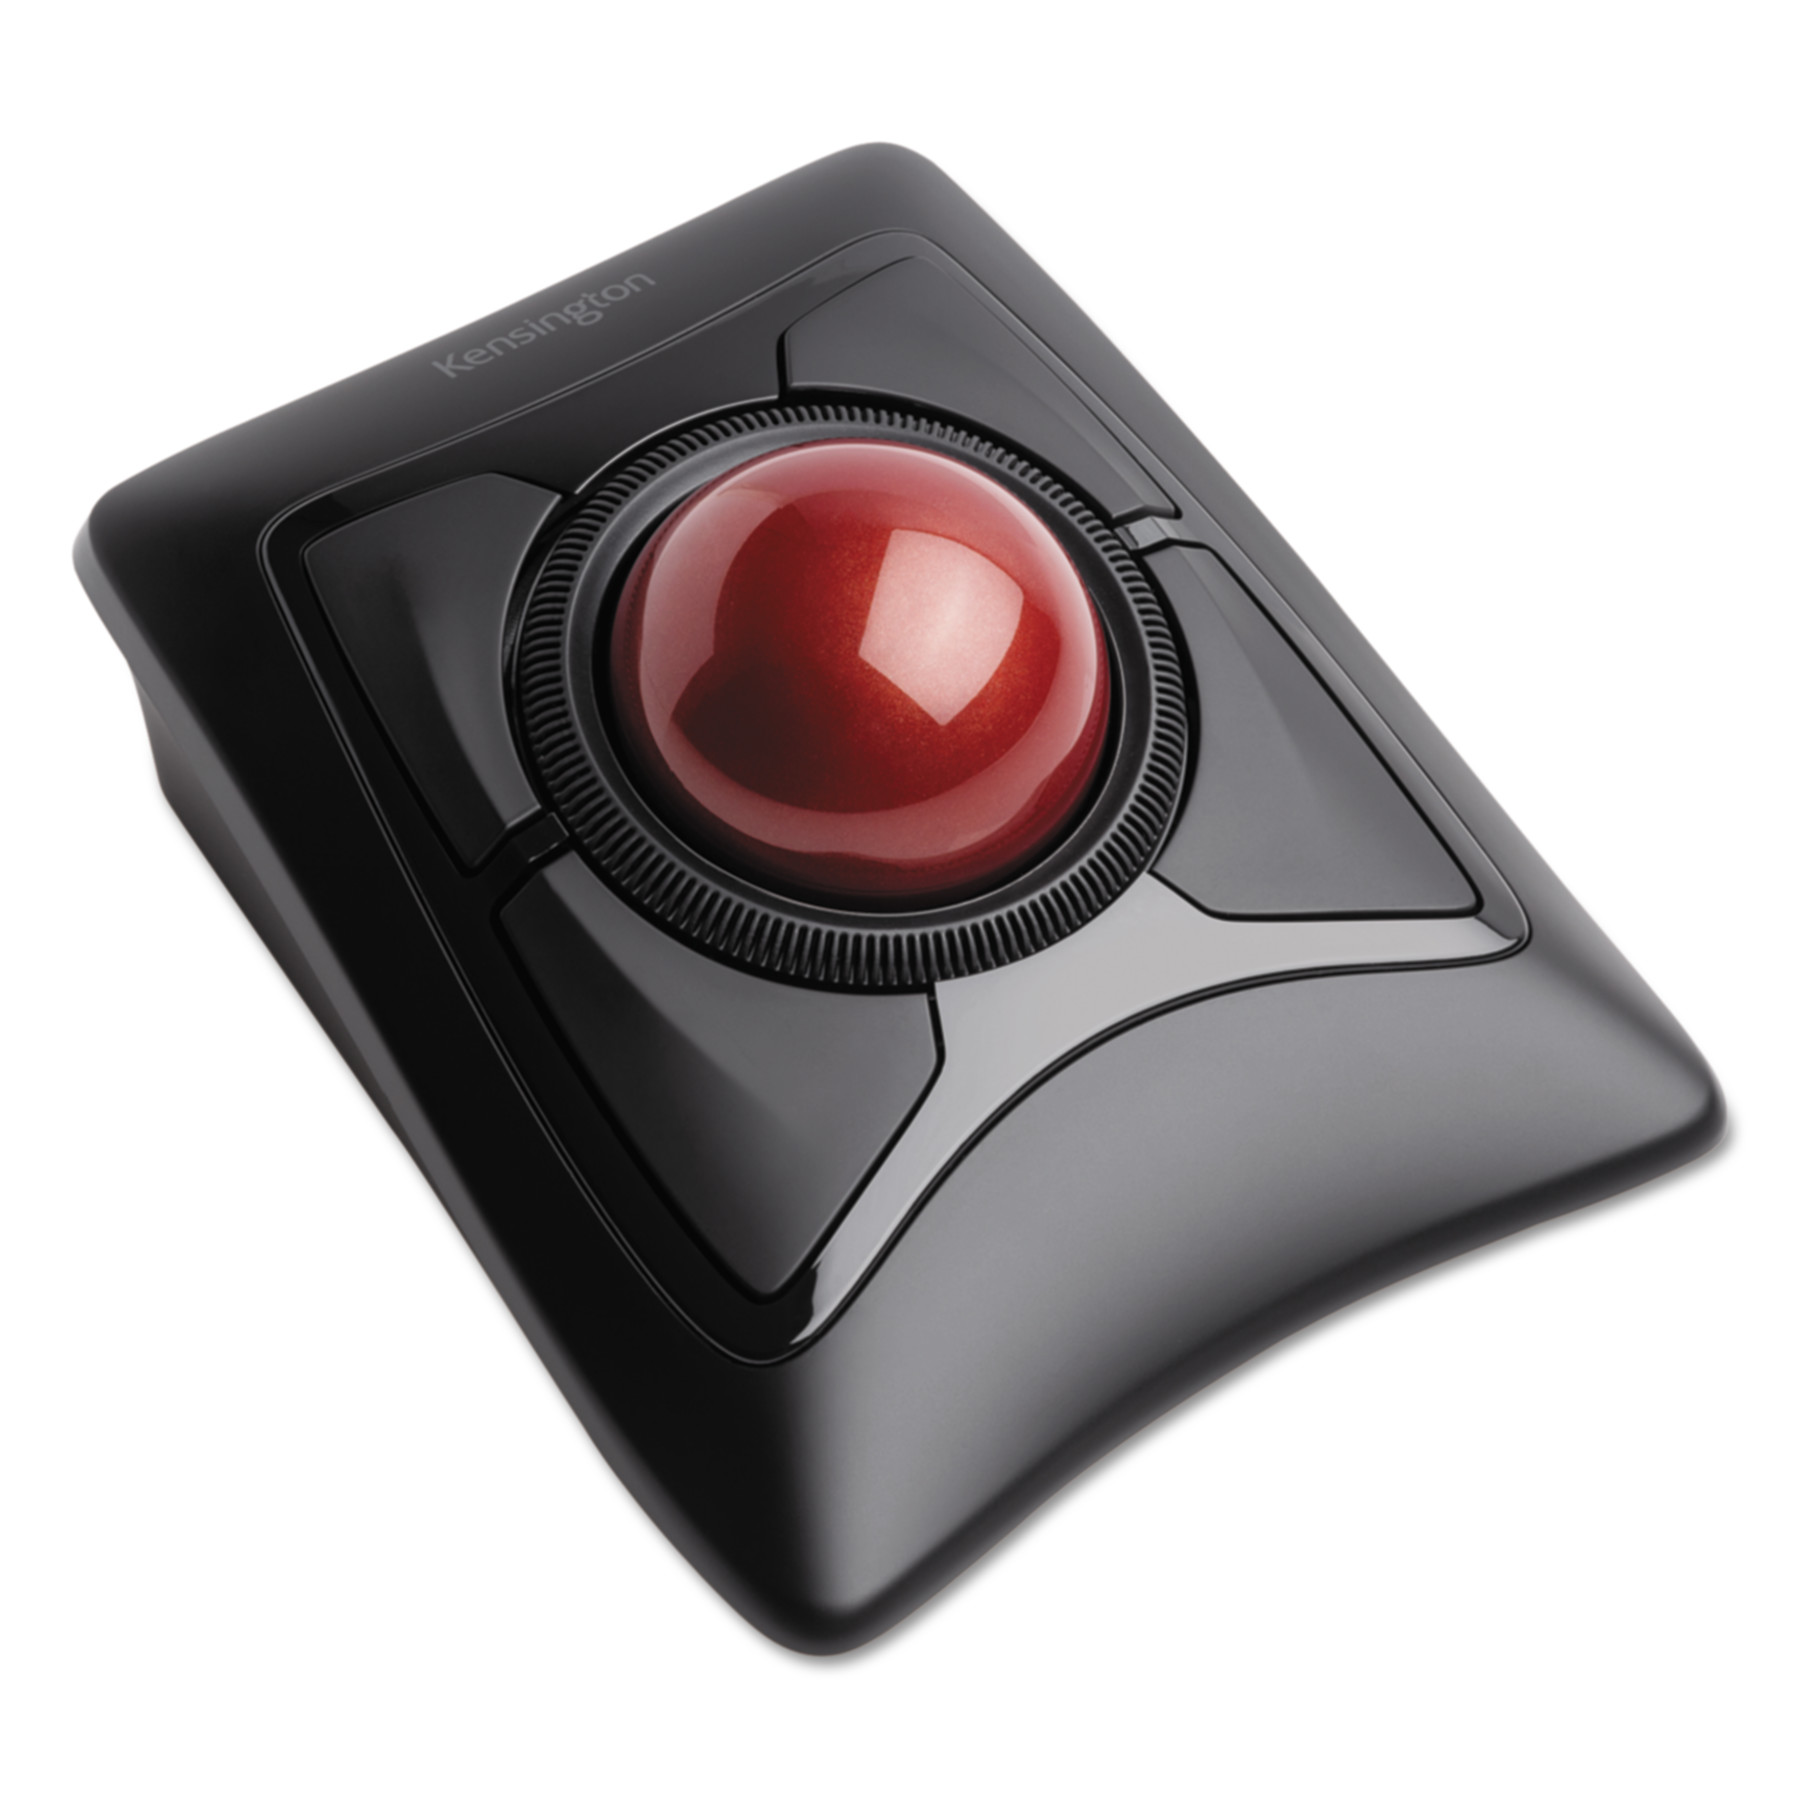 Kensington Expert Mouse Wireless Trackball, Four Buttons, Black by Kensington